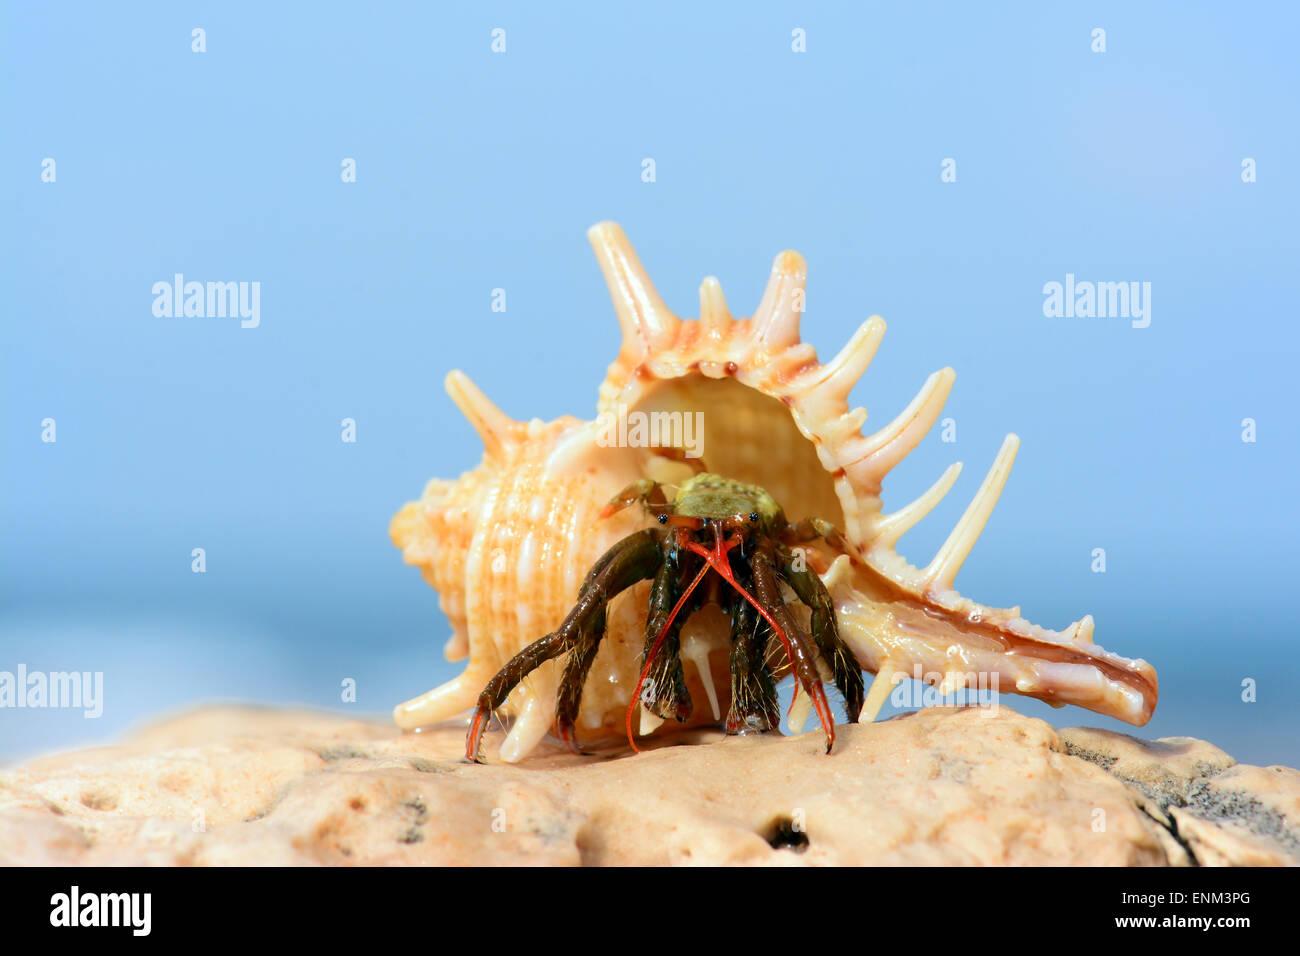 hermit crab walking on a rock - Stock Image